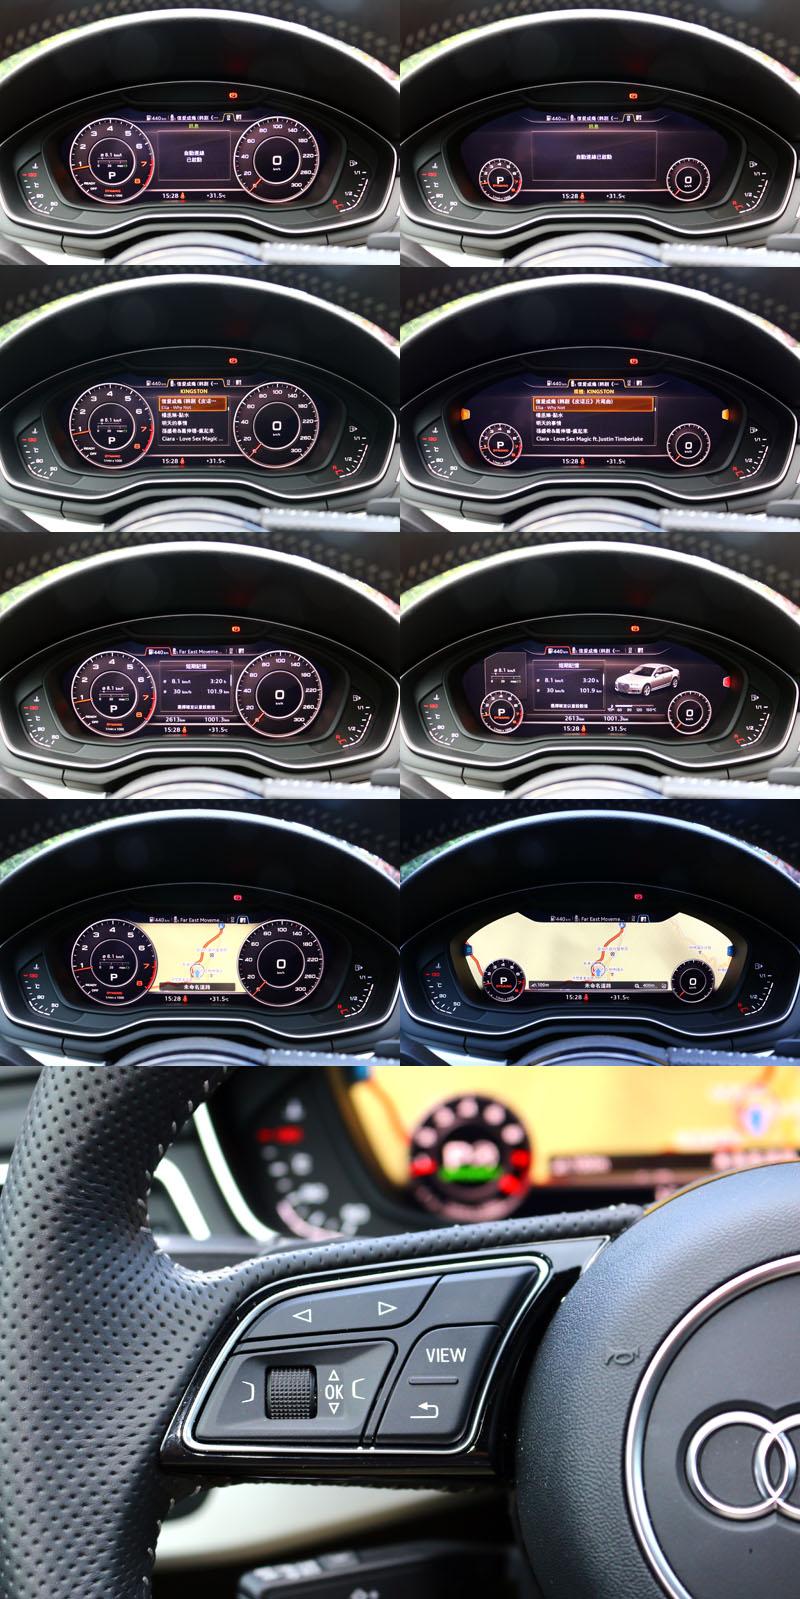 Audi Vitural Cpckpit全數位虛擬座艙將整個傳統儀錶板改為12.3吋的高畫質LED螢幕,可將所有眾多資訊整合顯示,並可透過方向盤快捷鍵、聲控功能操作。右側為經典顯示模式,右為全景模式。